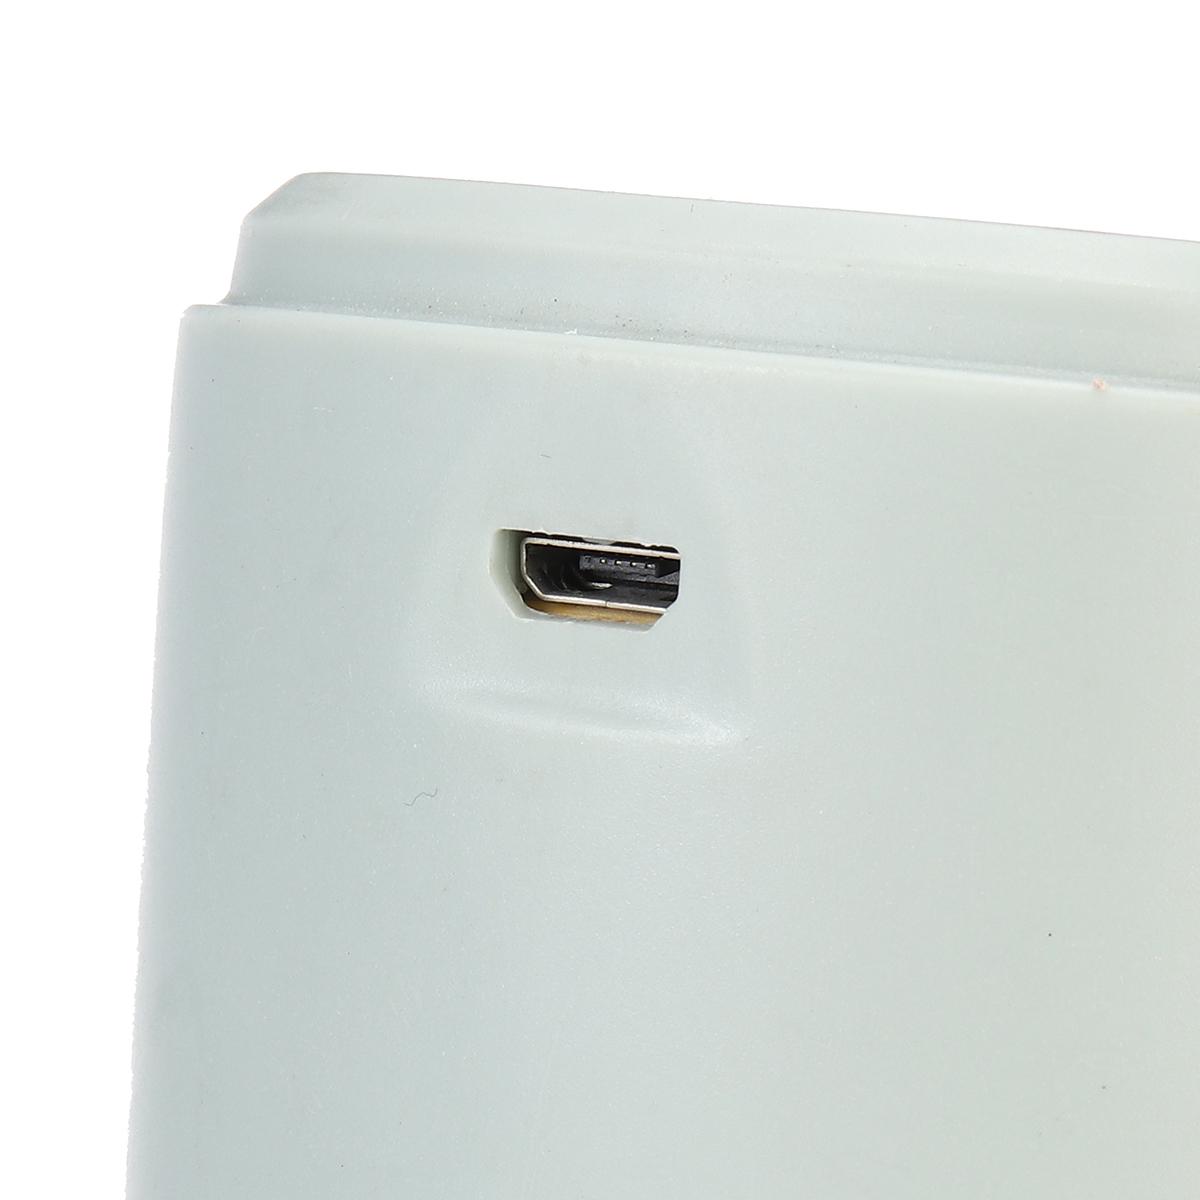 USB Automatic Water Pump Dispenser Gallon Bottle Pump Electric Drinking Machine Pump